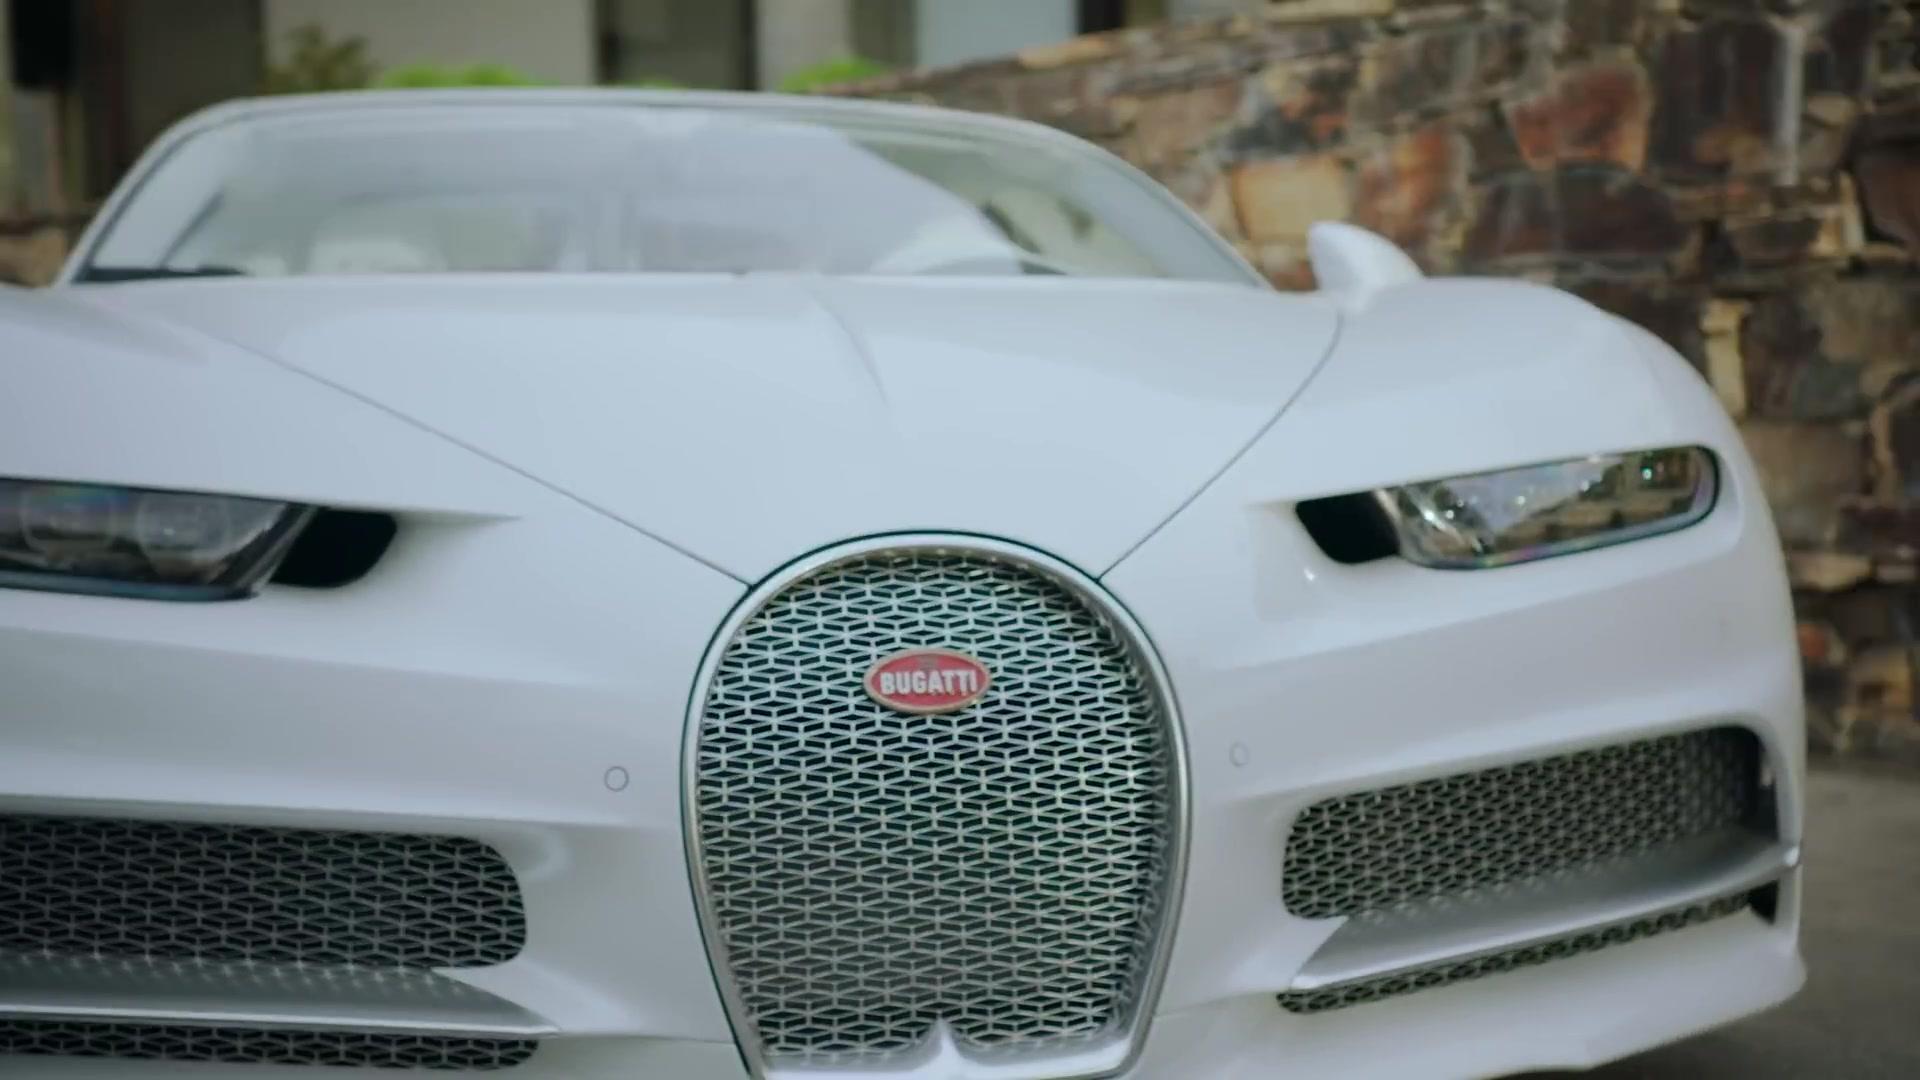 Bugatti Chiron White Super Sports Car In Saint-Tropez By Post Malone (2019)